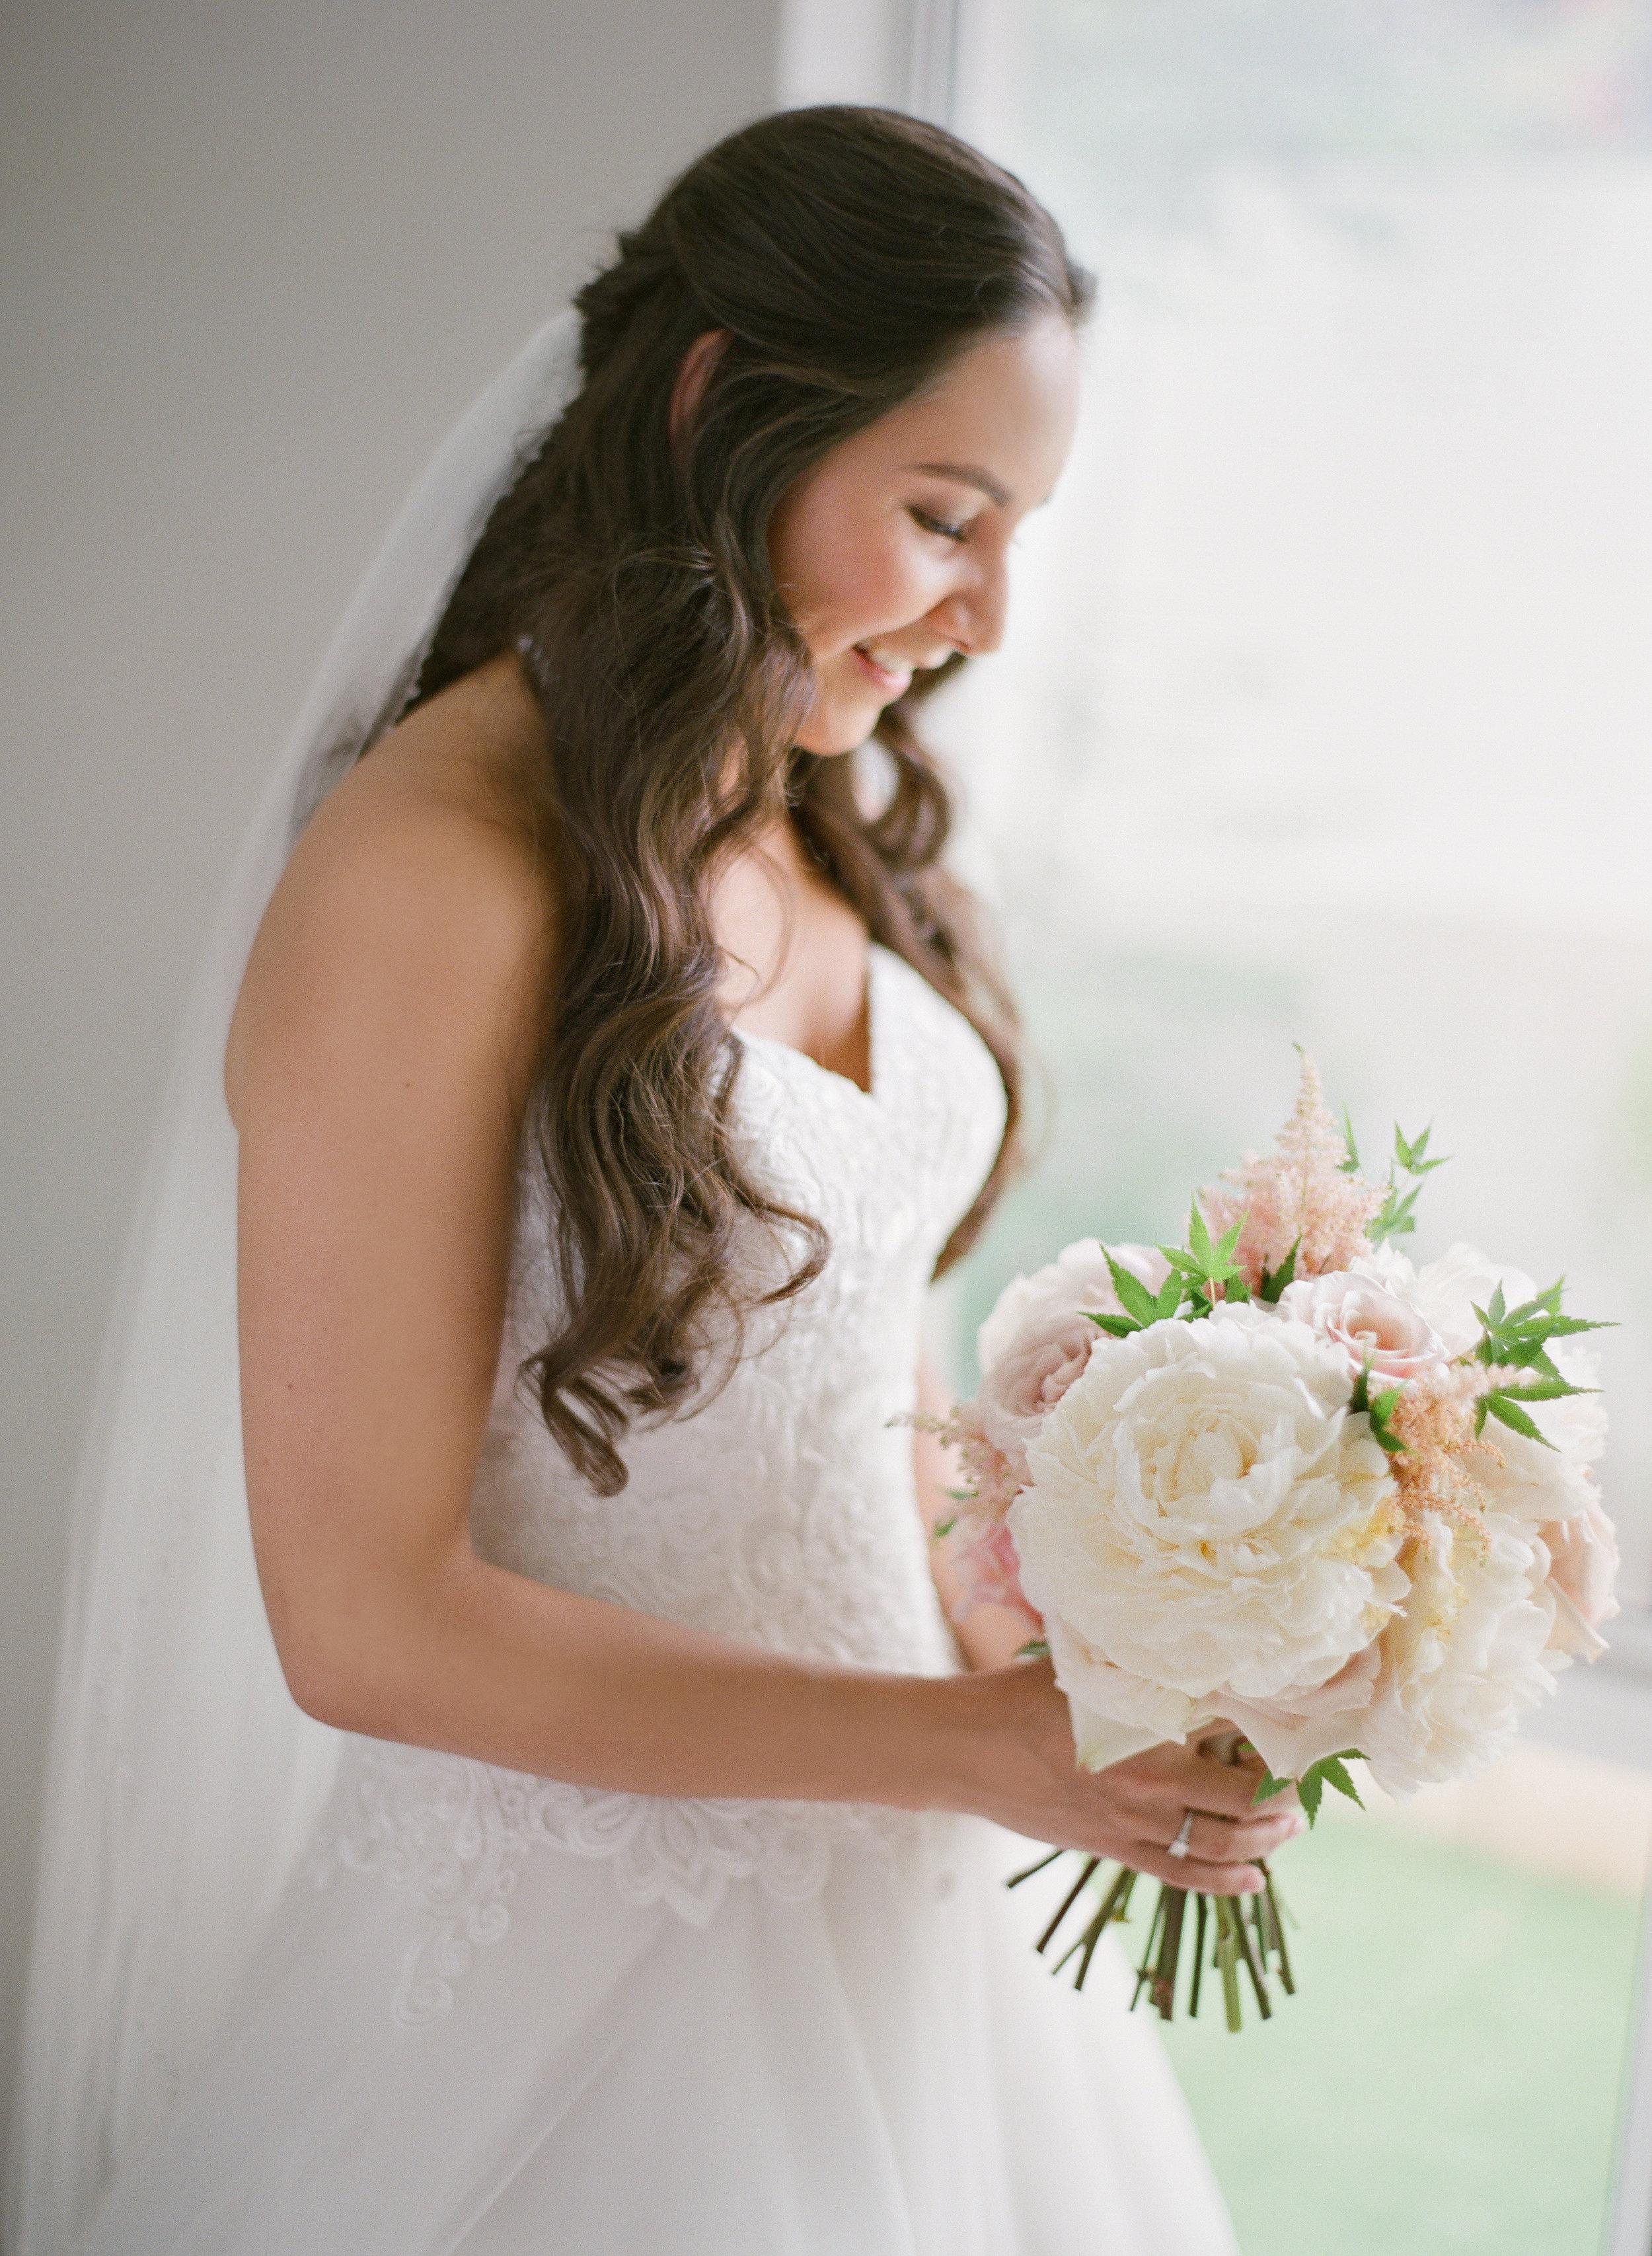 YK_wedding17_0155.jpg